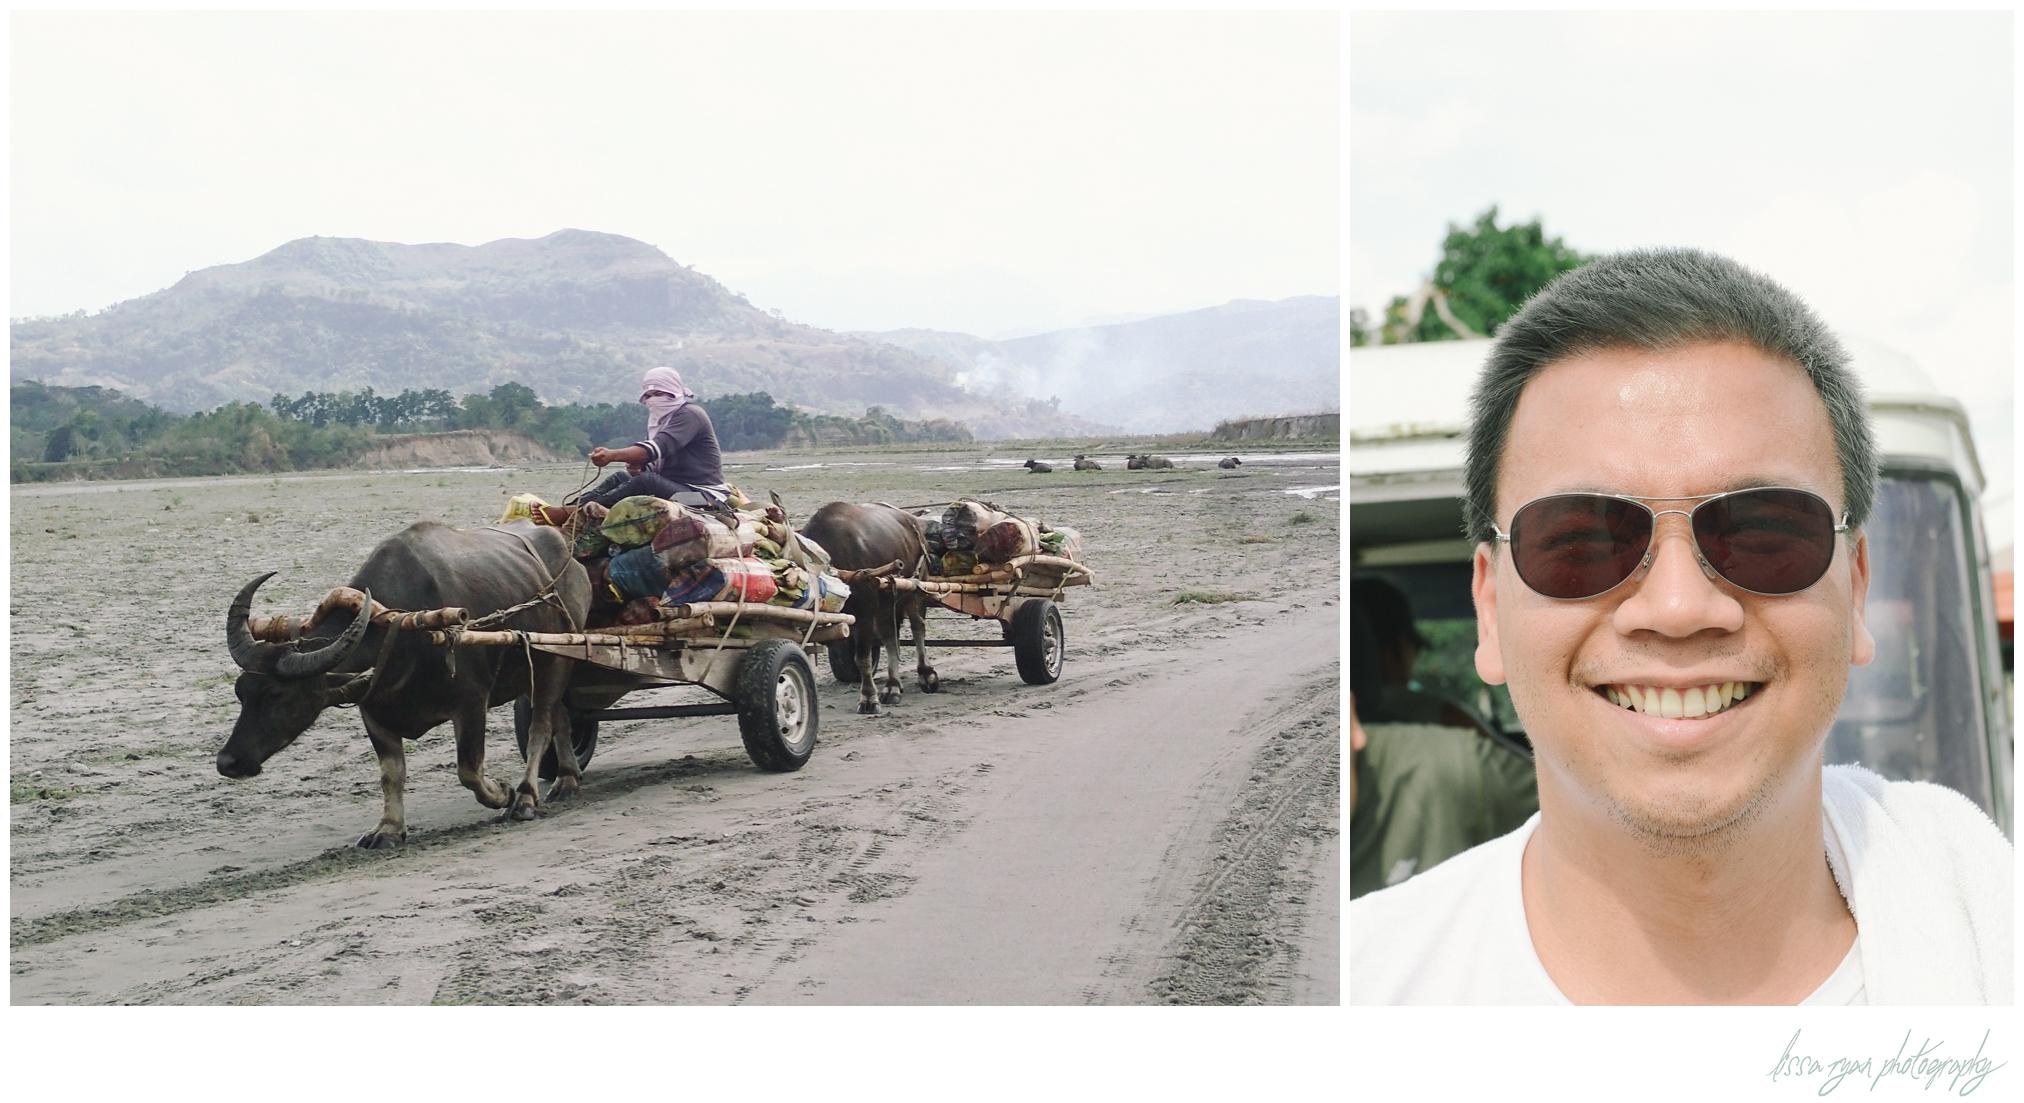 mt. pinatubo crater lake volcano philippines travel photographer hike lissa ryan photography